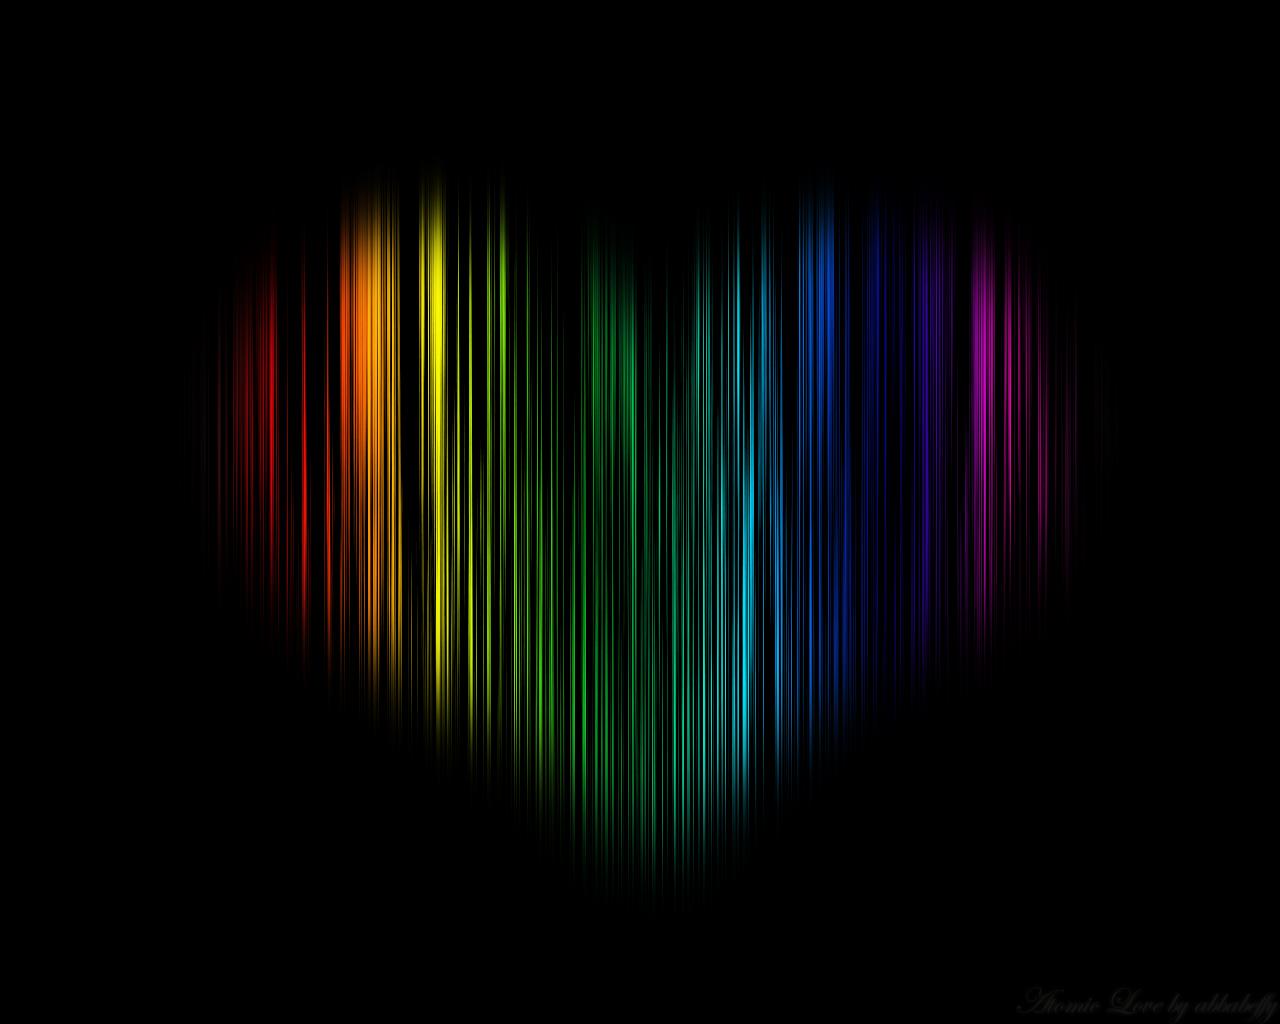 Cool Wallpaper Name Nasir - atomic_colorful_love-normal5  Pic_45575.jpg